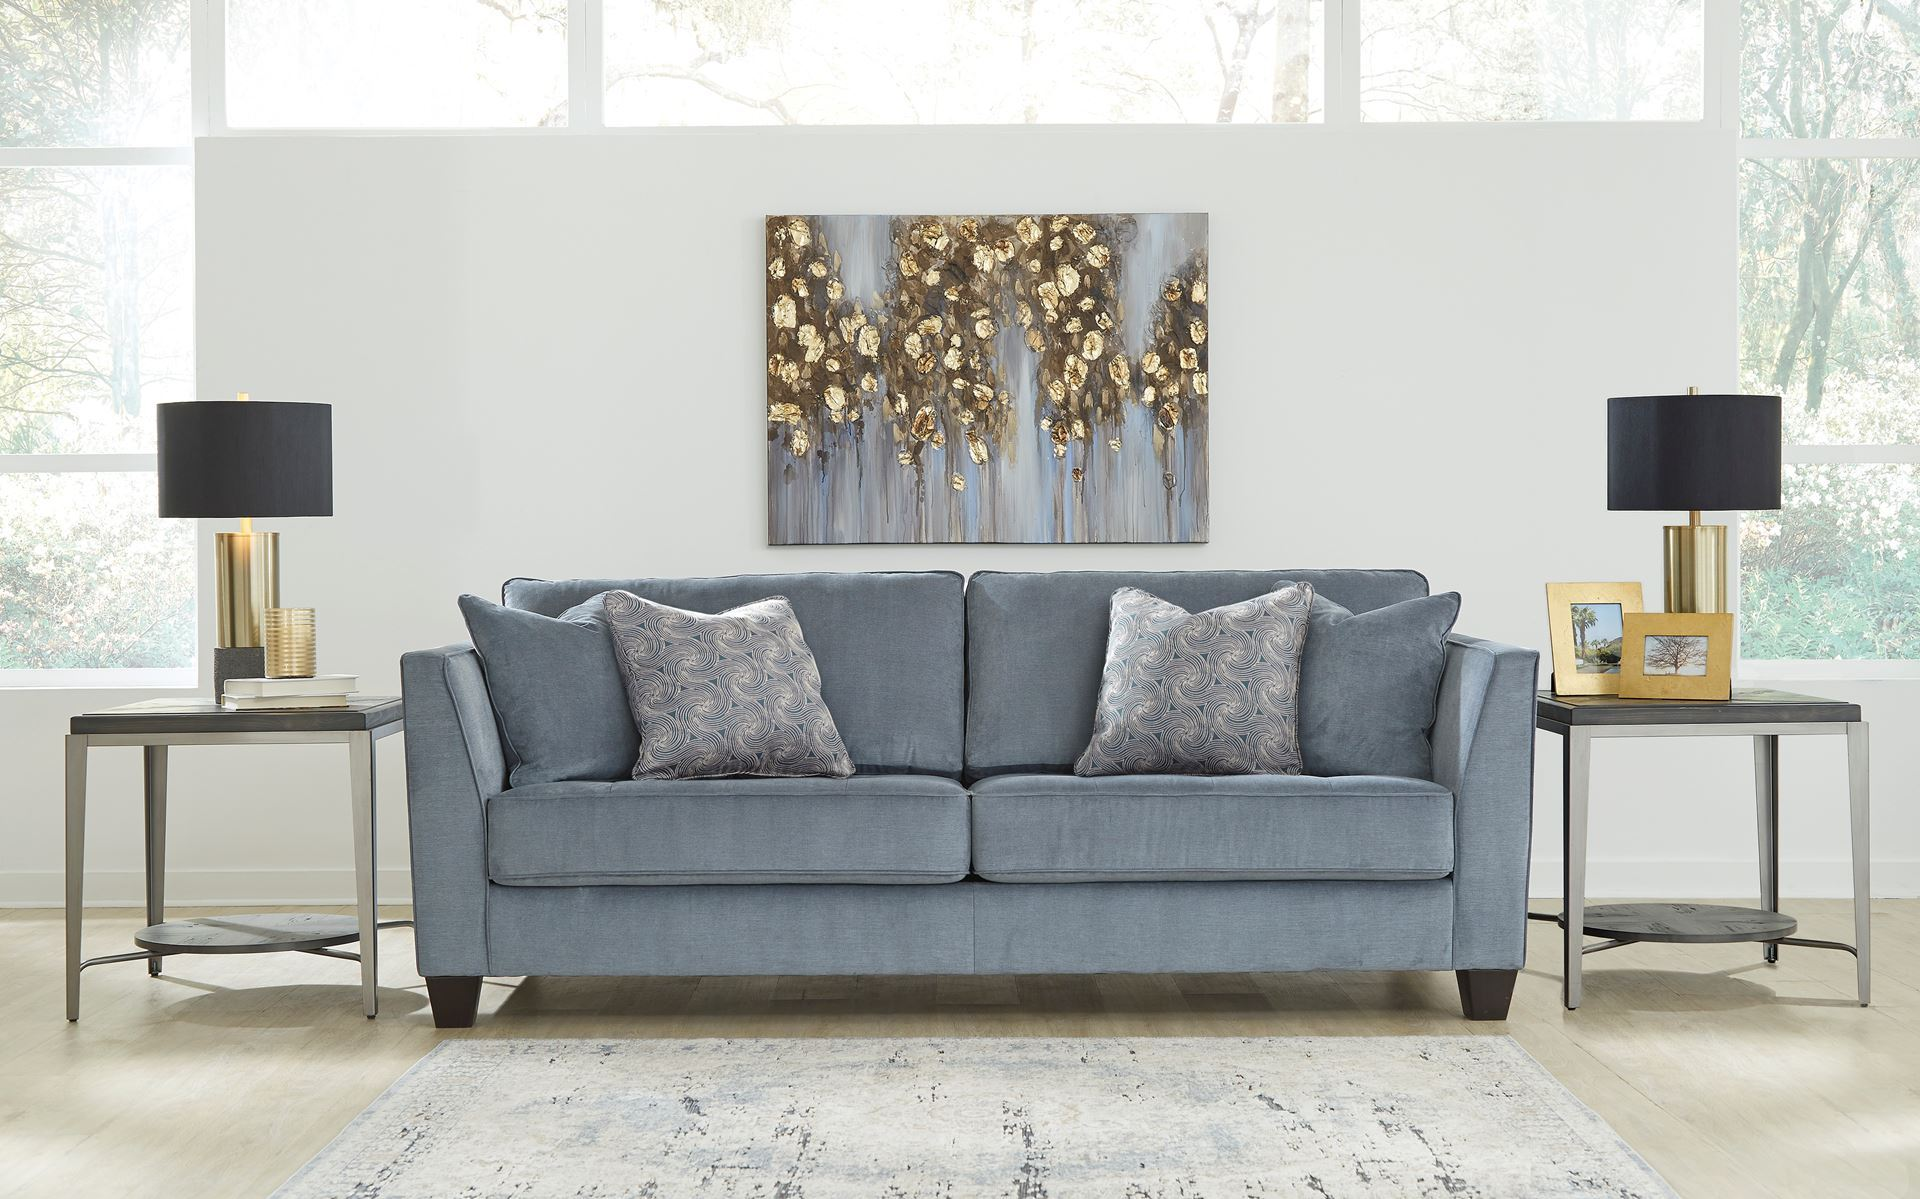 Wondrous Sciolo Sofa Andrewgaddart Wooden Chair Designs For Living Room Andrewgaddartcom